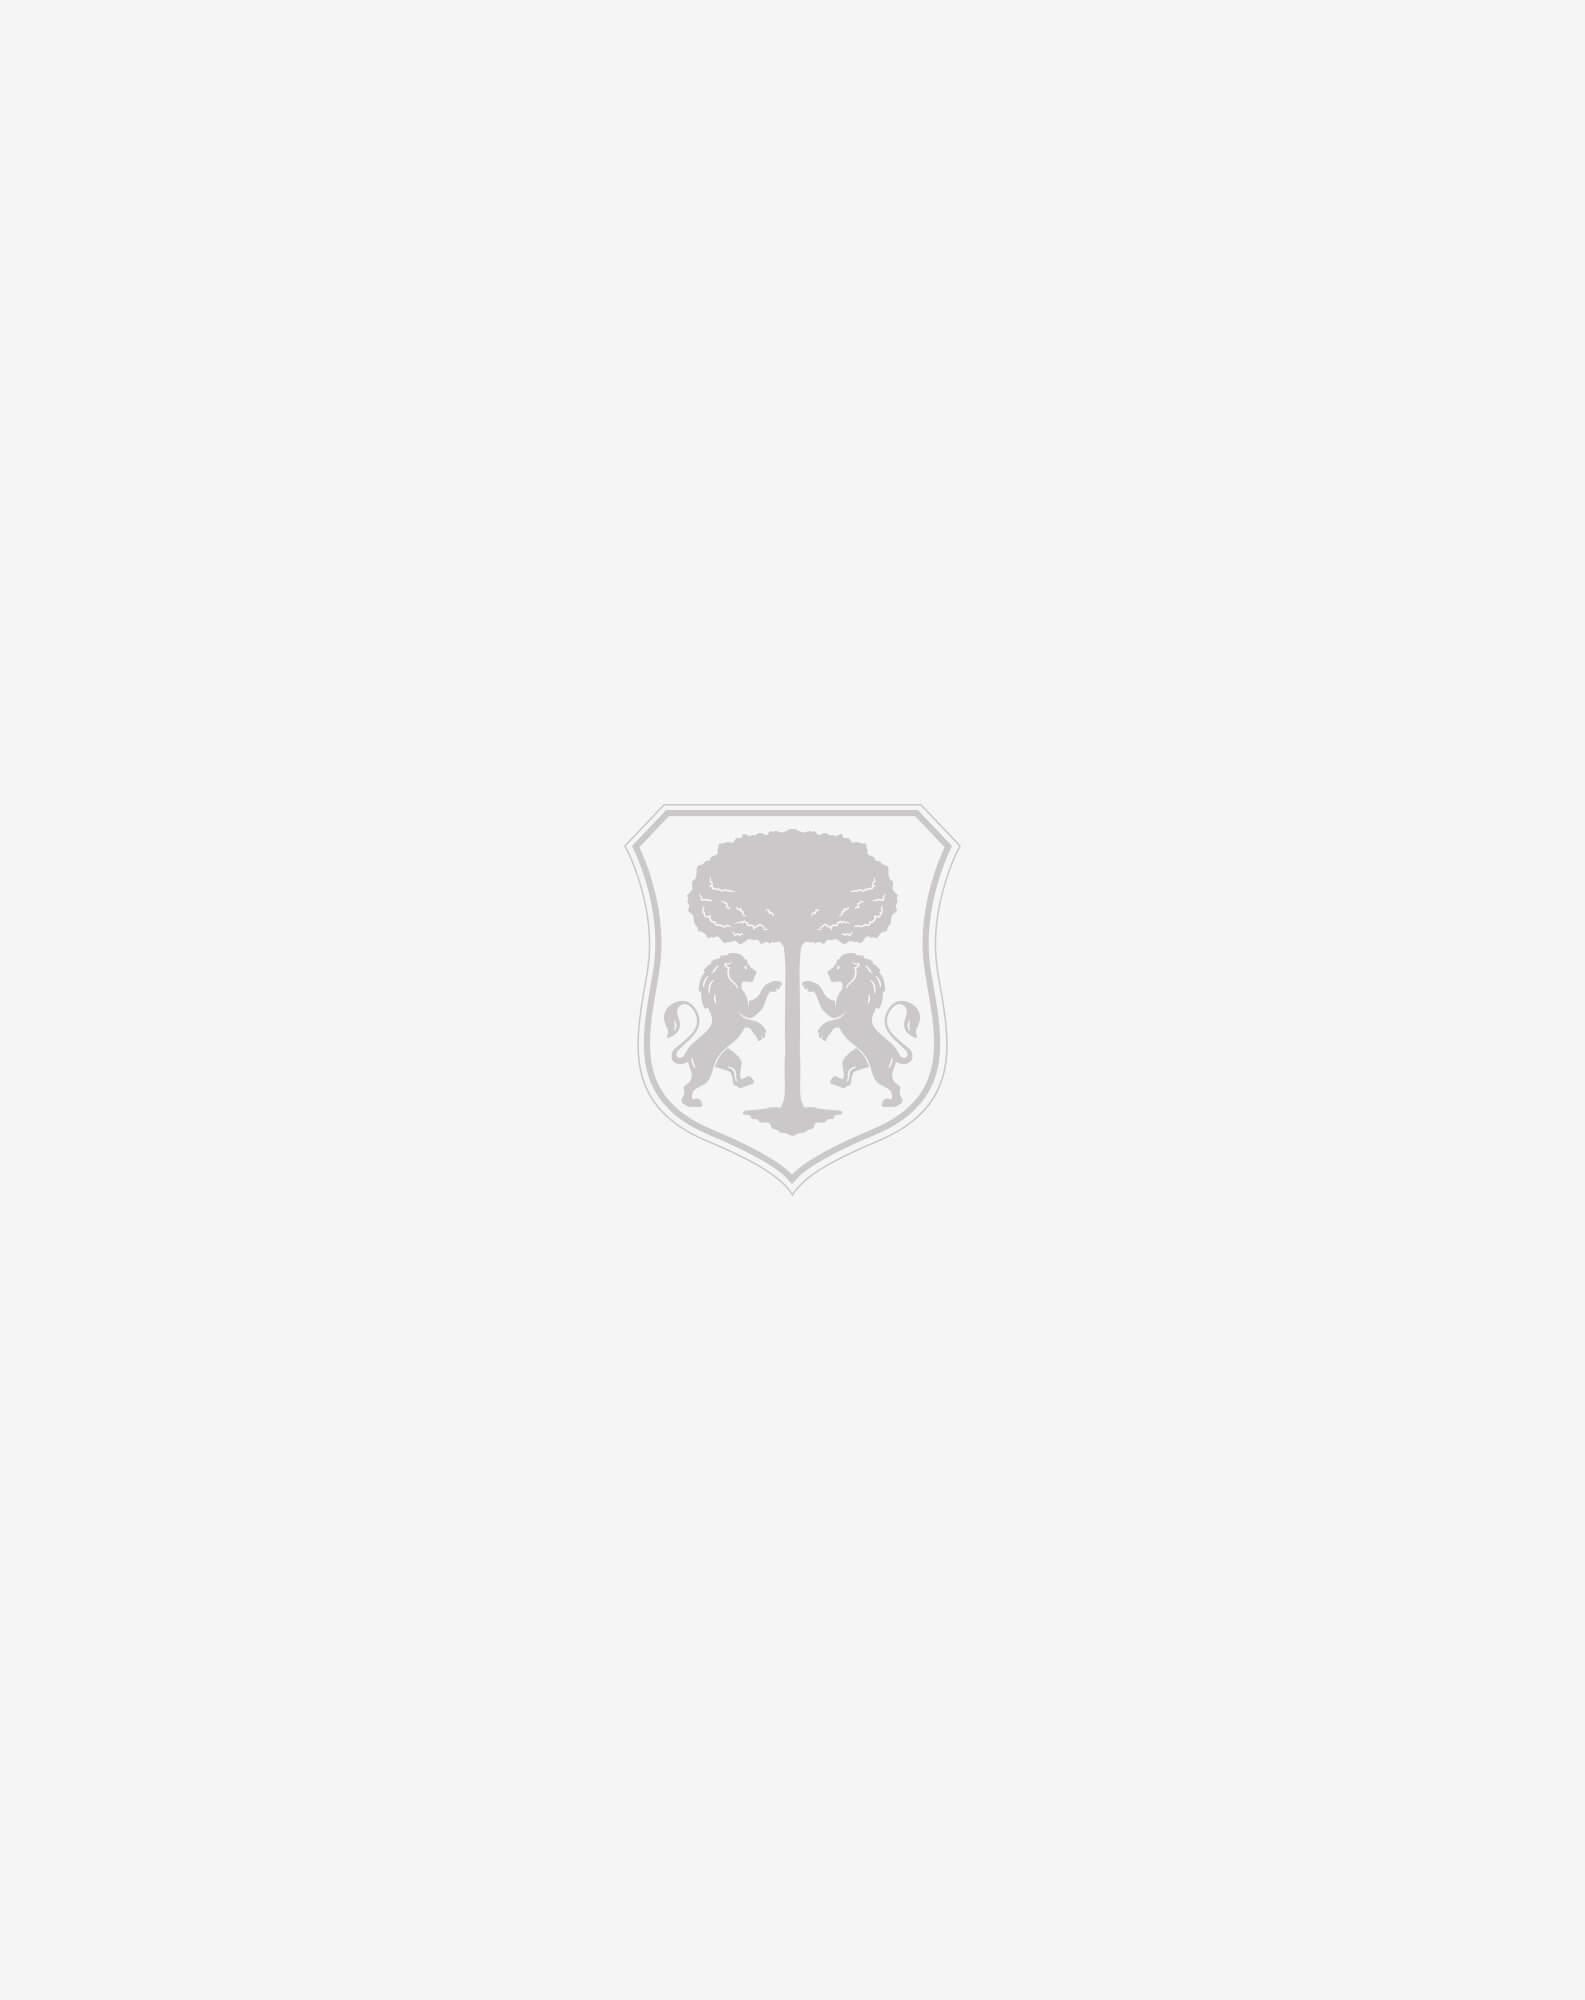 giacca tecnica blu con power bank